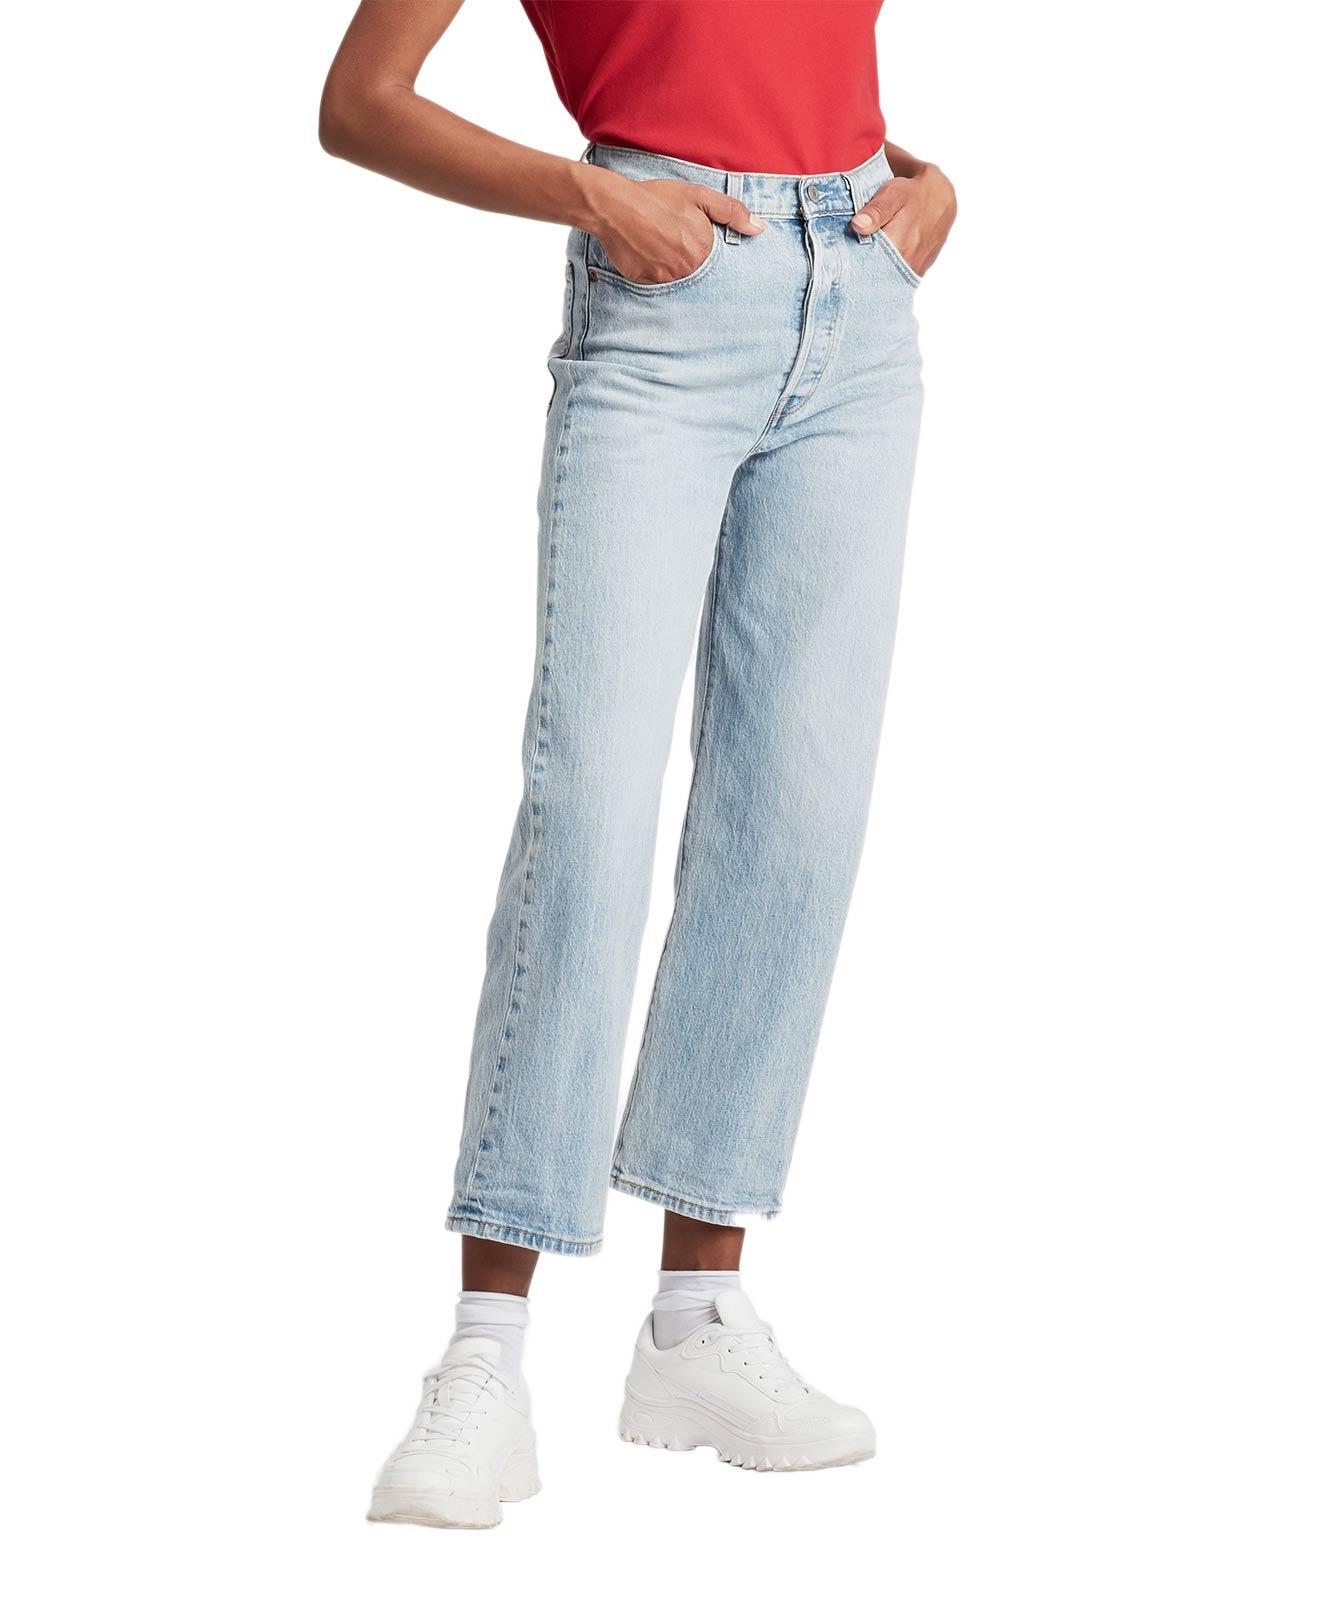 Hosen für Frauen - Levi's Ribcage gerade Ankle Jeans in Tango Waschung  - Onlineshop Jeans Meile